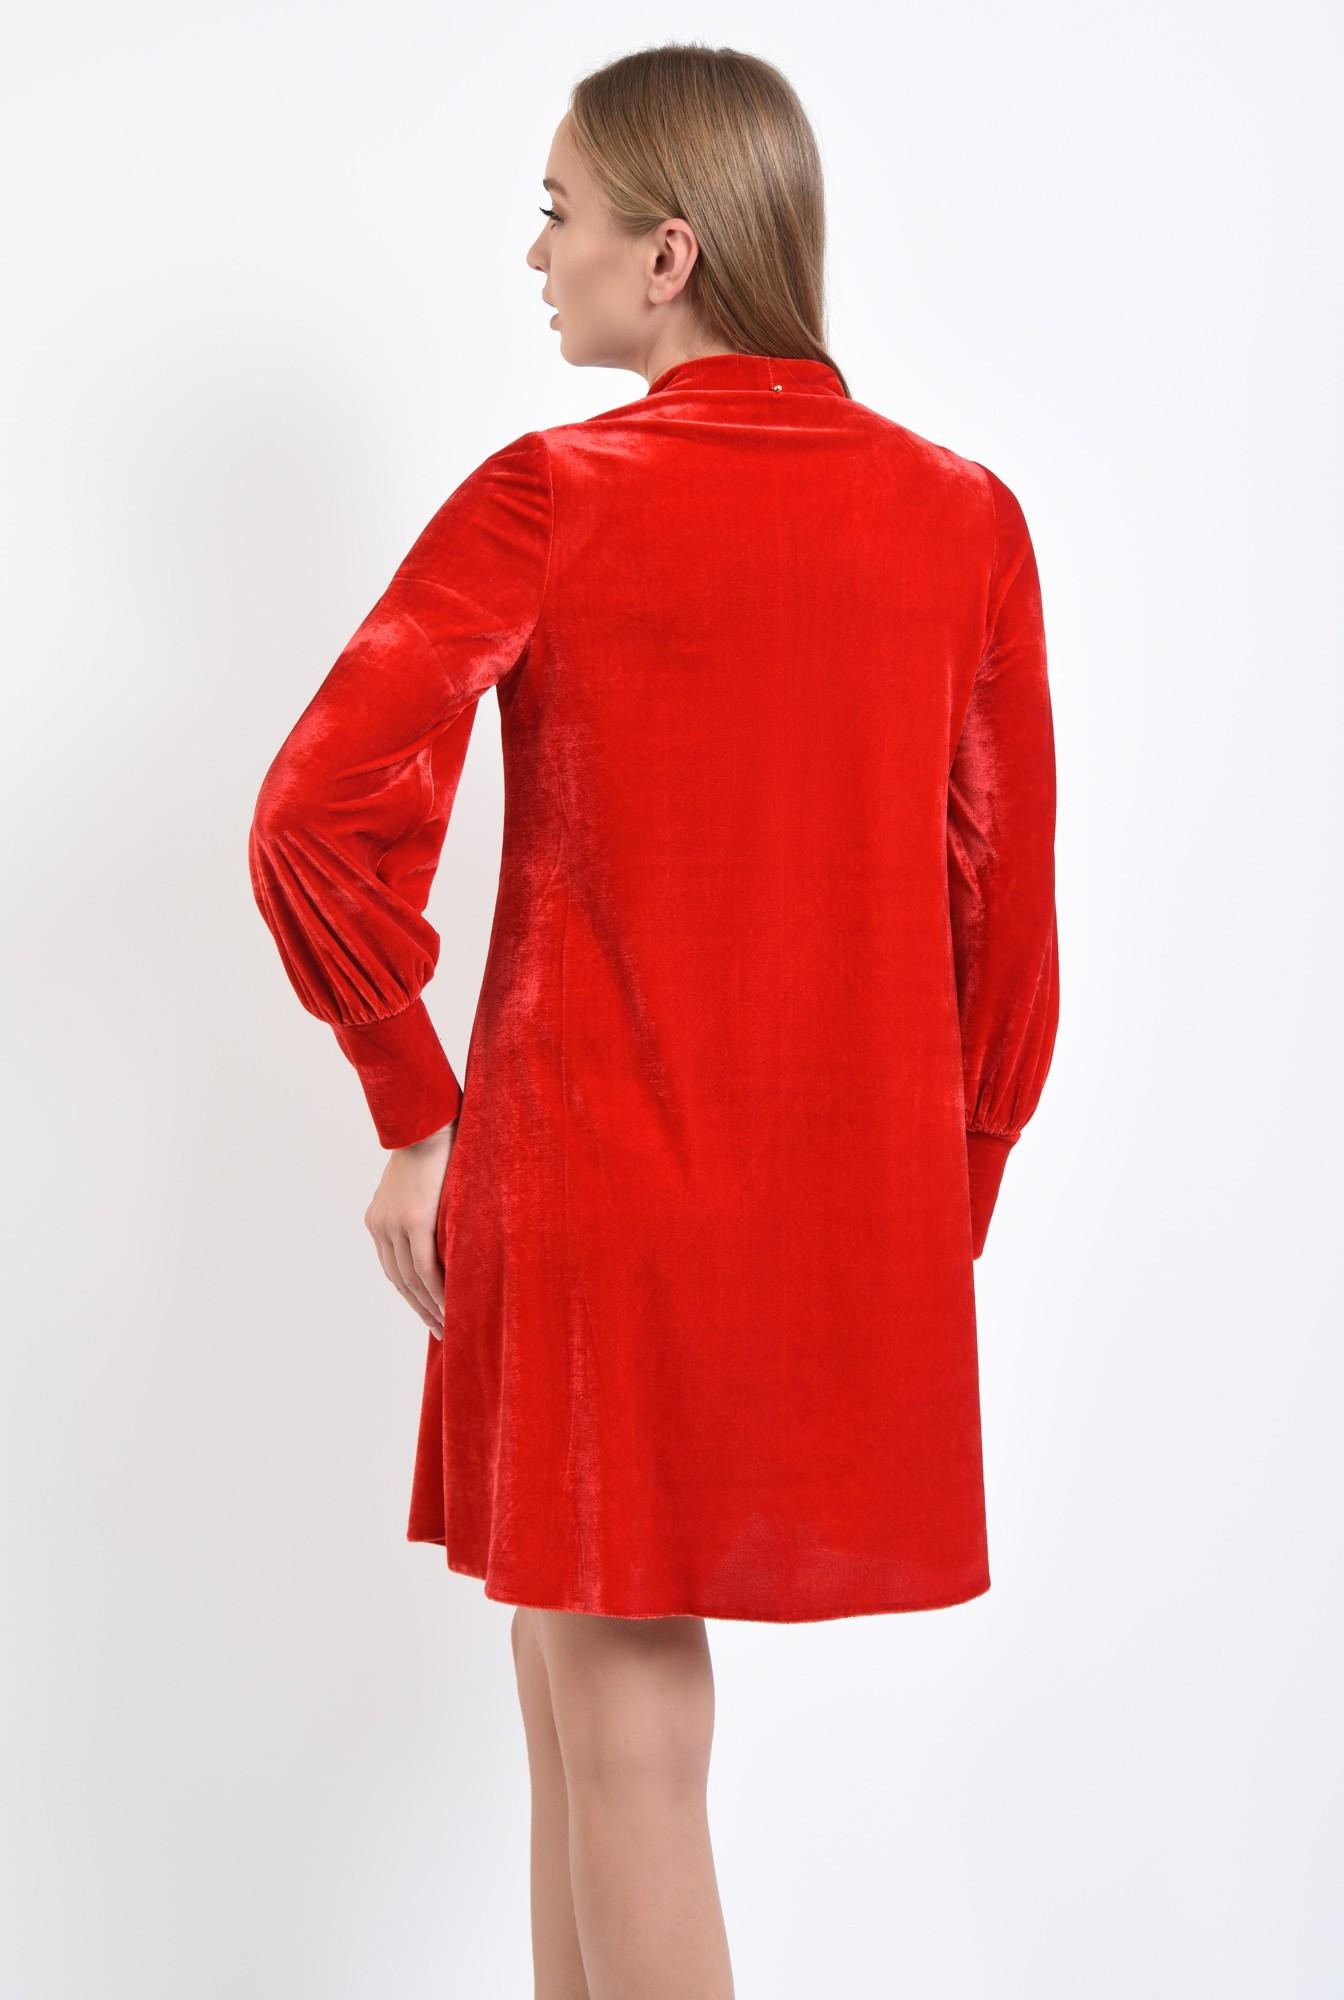 1 - rochie rosie, mini, croi larg, maneci bufante, decolteu anchior